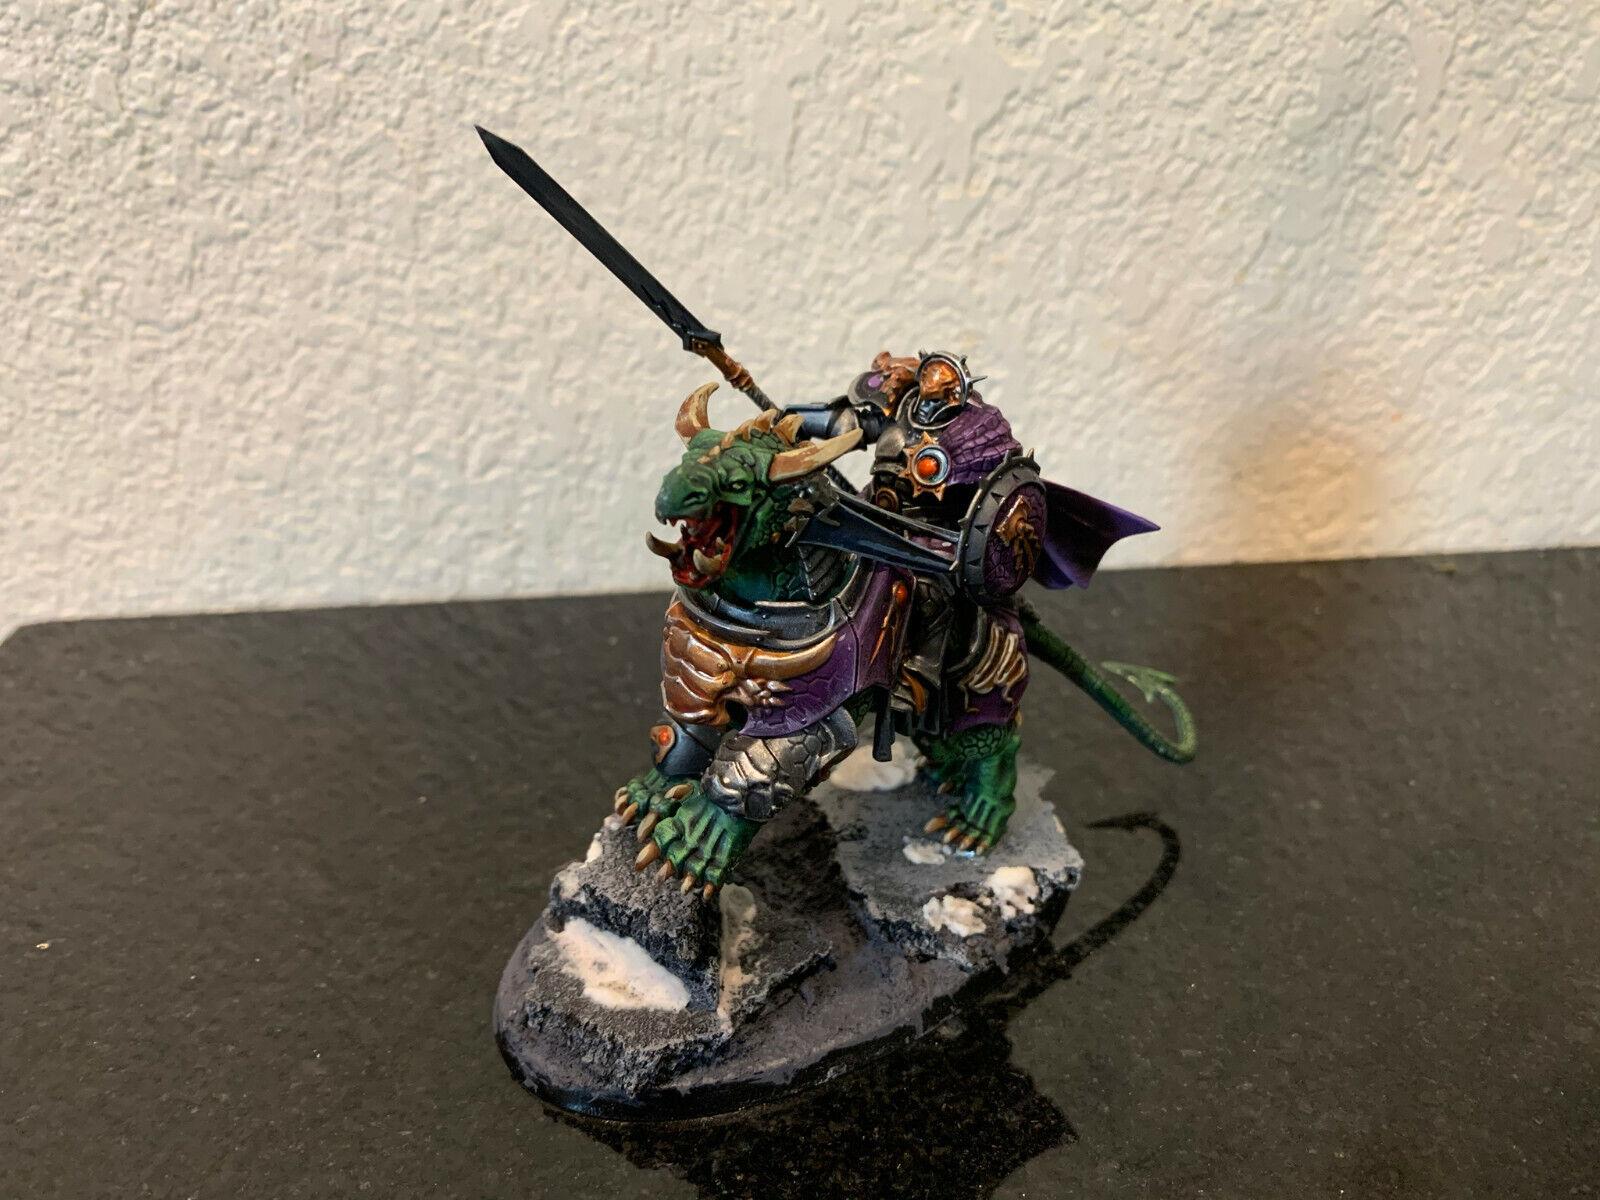 Warhammer Age of Sigmar - SCE - Vandus Hammerhand - Well Painted